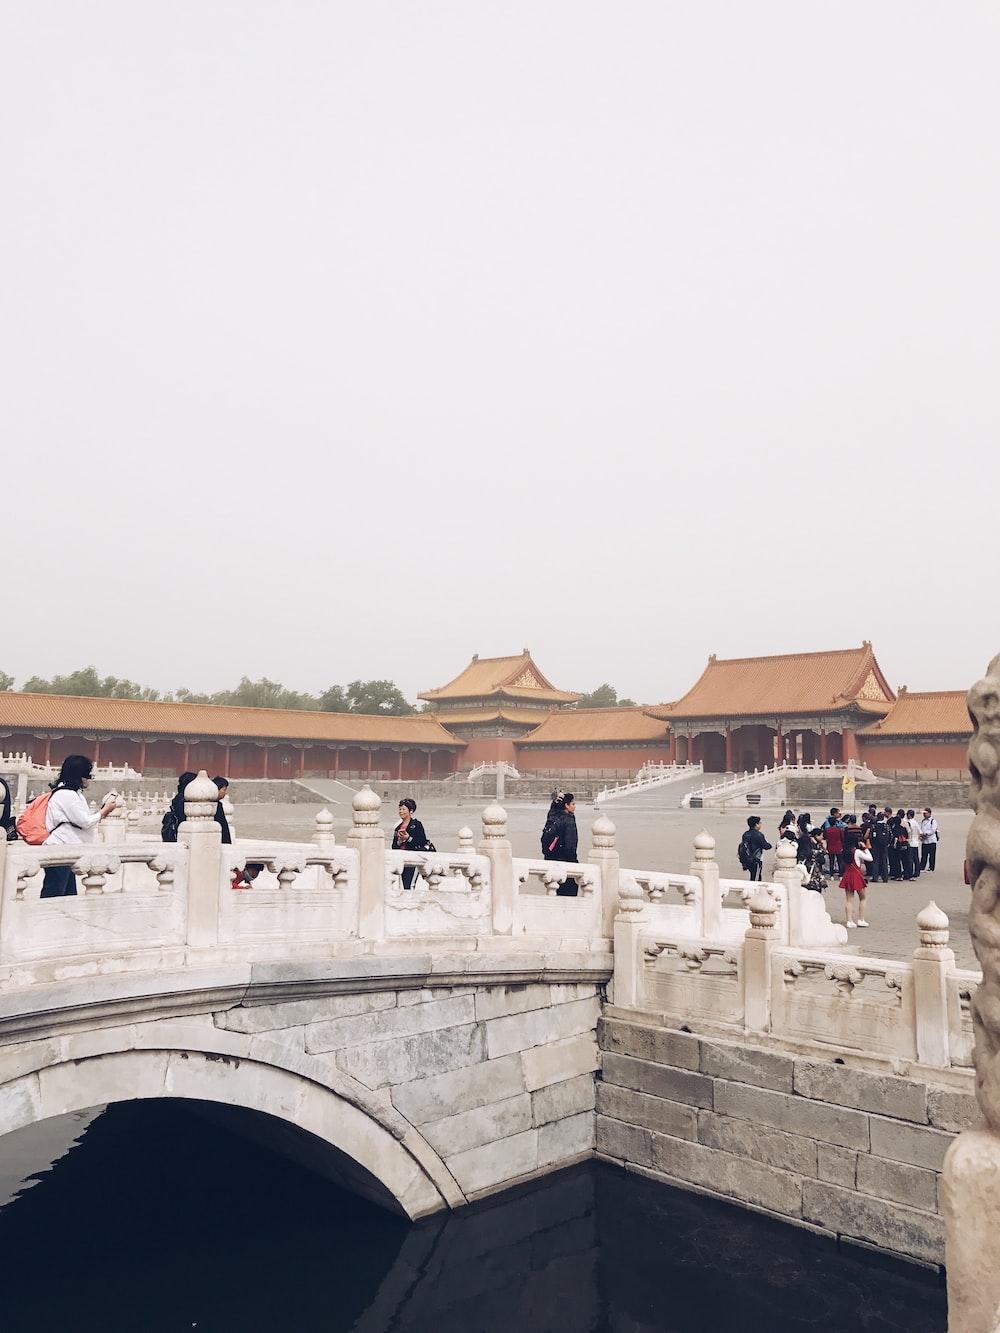 people walking near Forbidden City in Beijing China during daytime